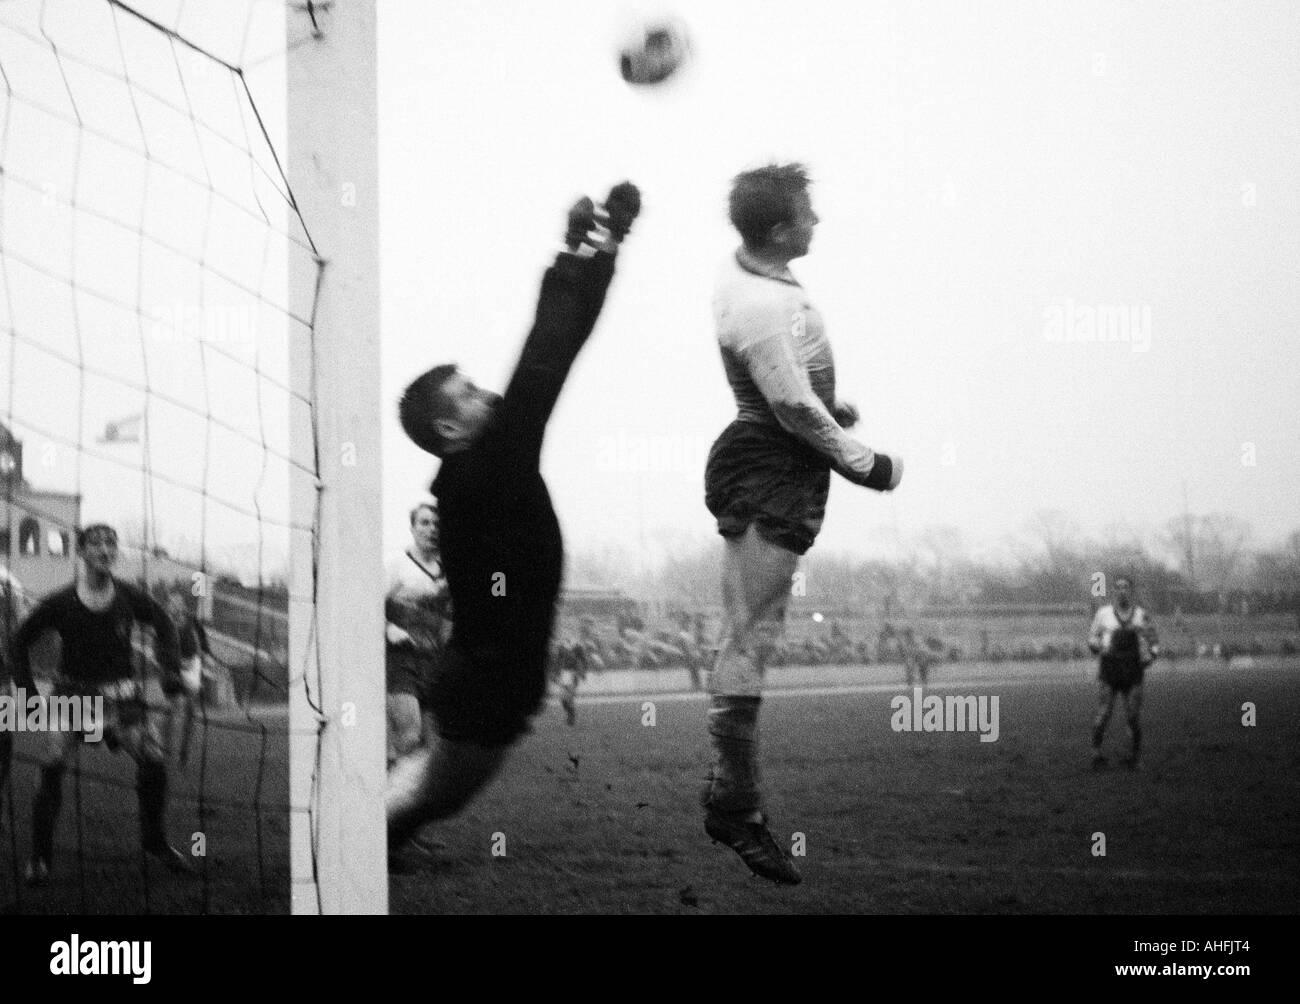 football, Regionalliga West, 1966/1967, Rot-Weiss Oberhausen versus VfL Bochum 4:4, Niederrhein Stadium in Oberhausen, scene of the match, punched clearance by keeper Helmut Traska (RWO) left, right Albert Eichholz (RWO) - Stock Image